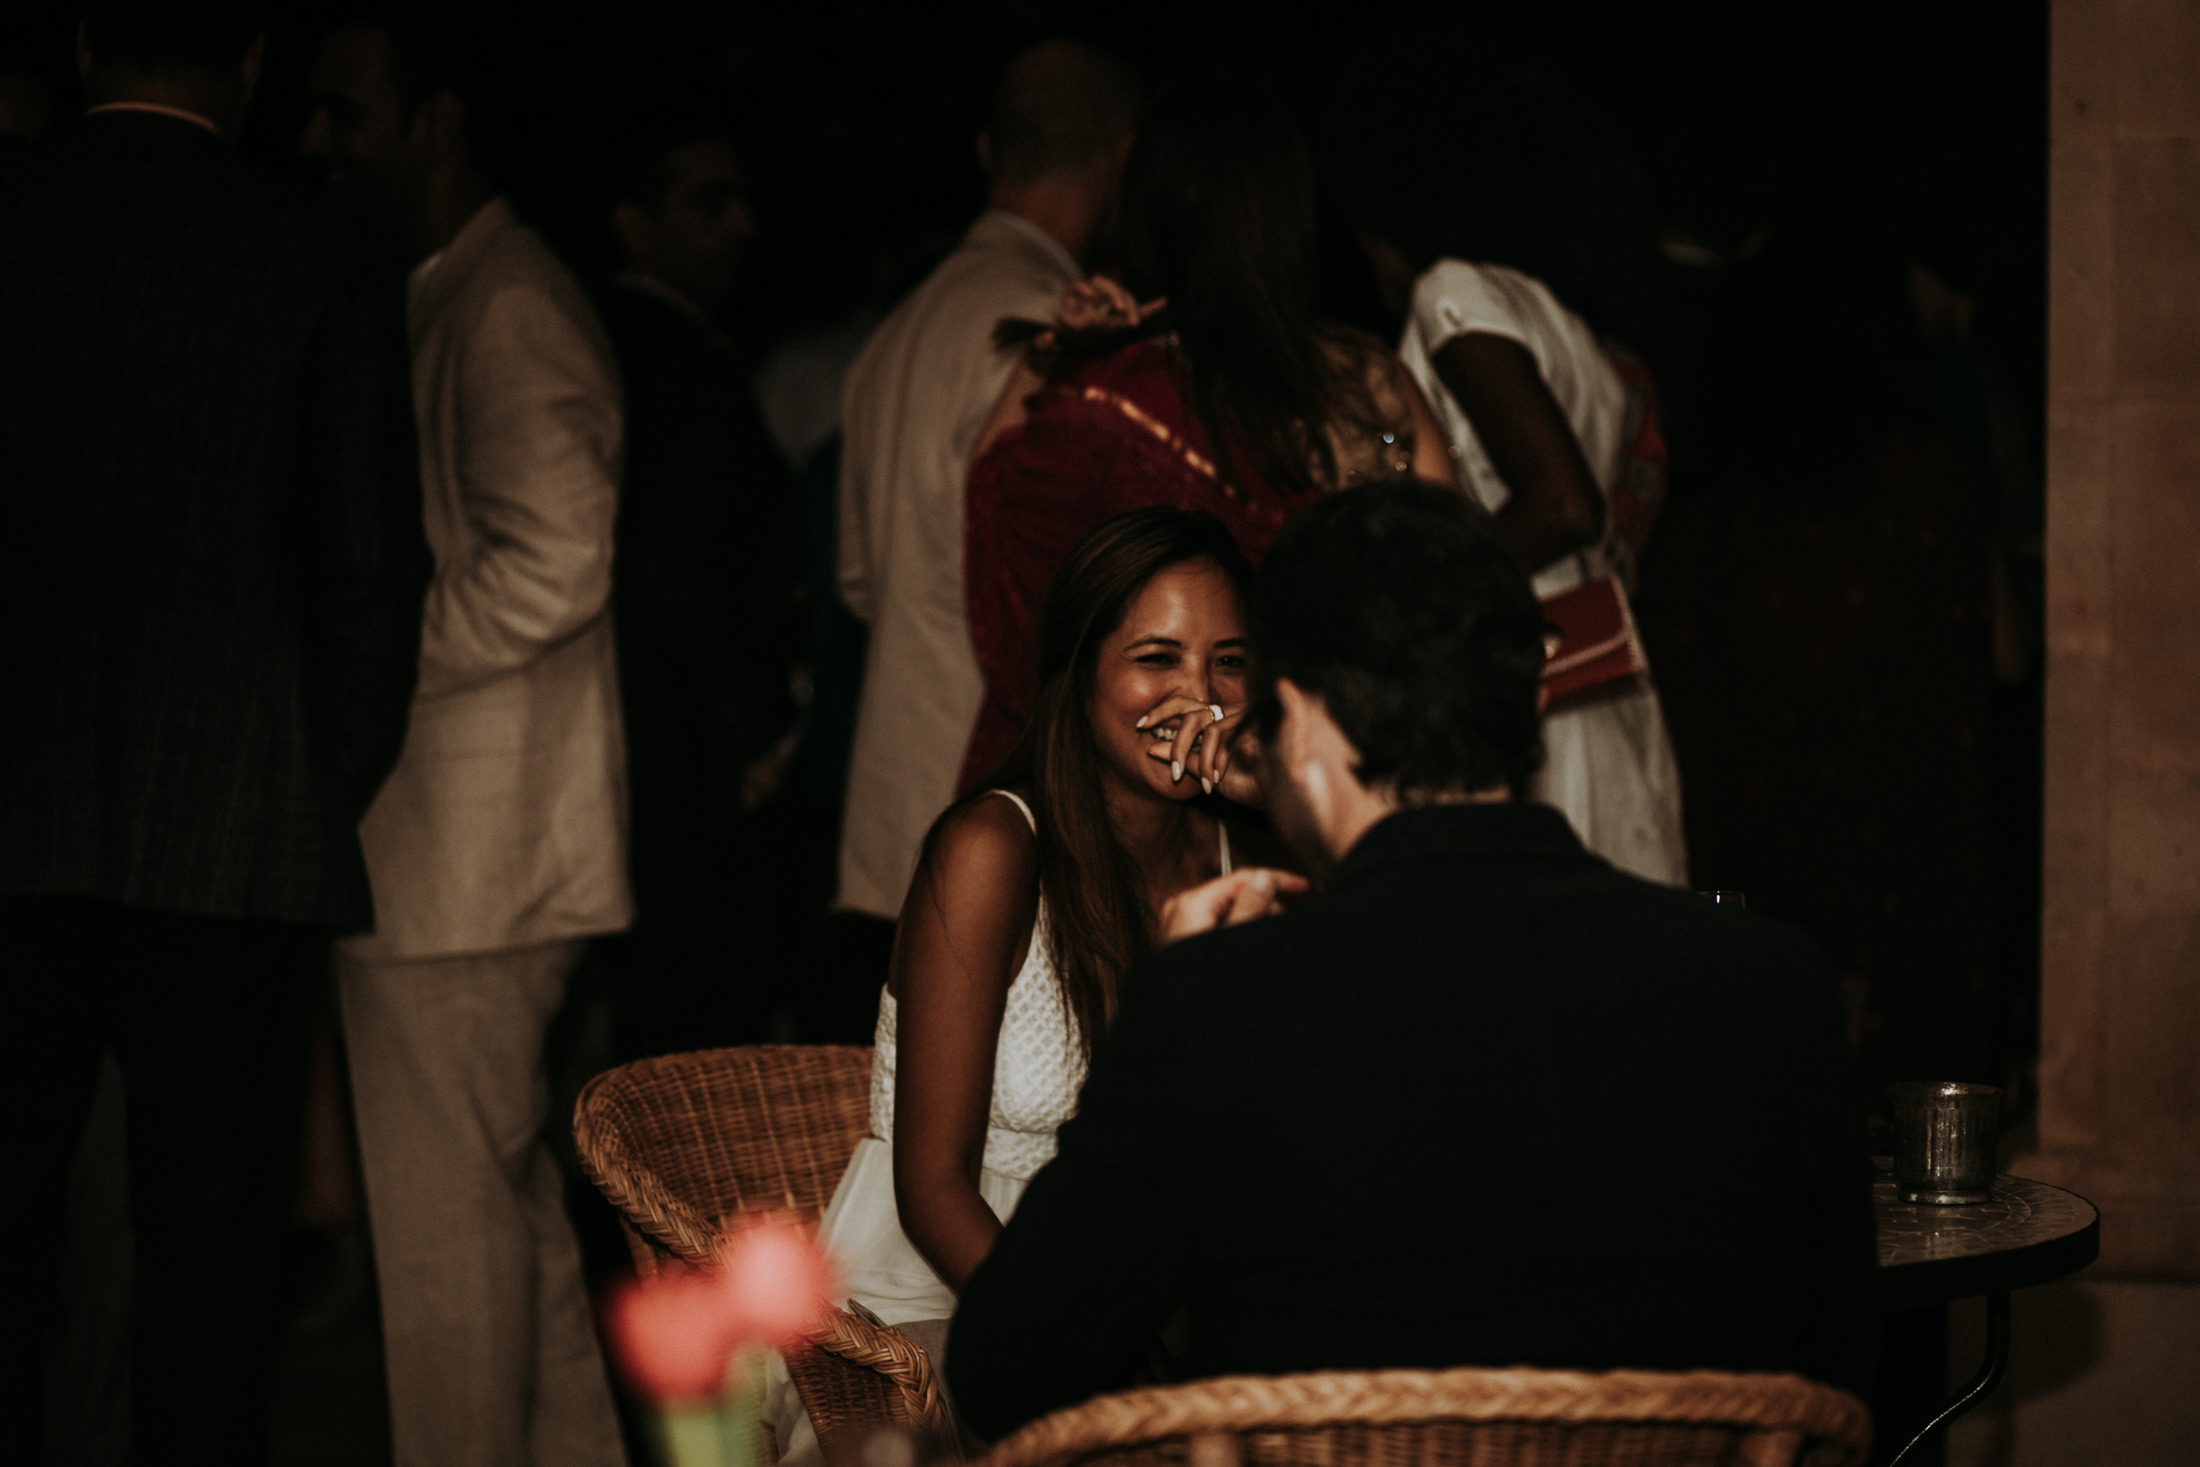 Wedding_Photographer_Mallorca_Daniela-Marquardt_Photography_New_York_Iceland_Tuscany_Santorini_Portugal_Austria_Bavaria_Elopement_Hochzeitsfotograf_AntjeRajat1_55